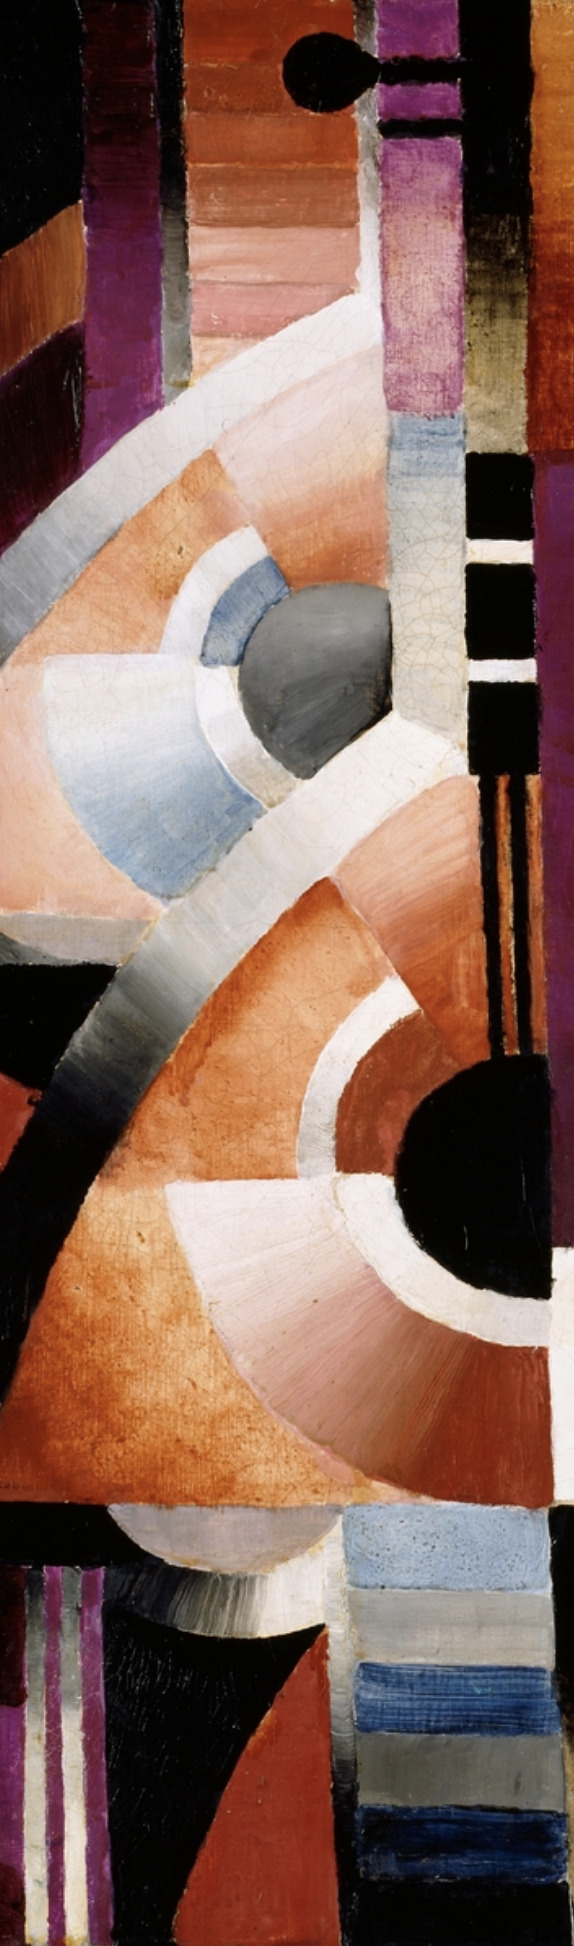 zscreenshot_2019-01-20 thorvald hellesen, balalaika – nasjonalmuseet – collection